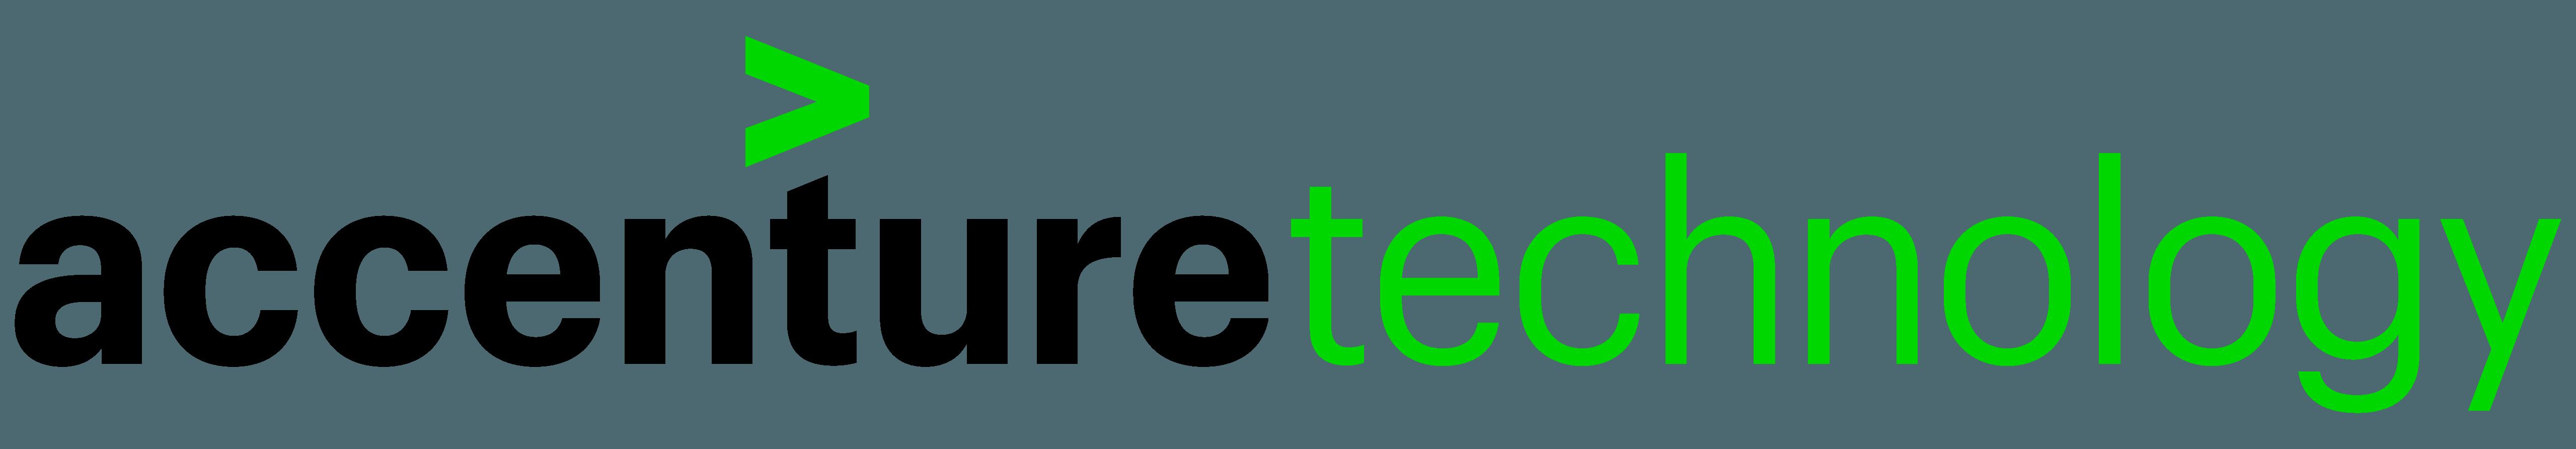 Accenture Technology Logo.